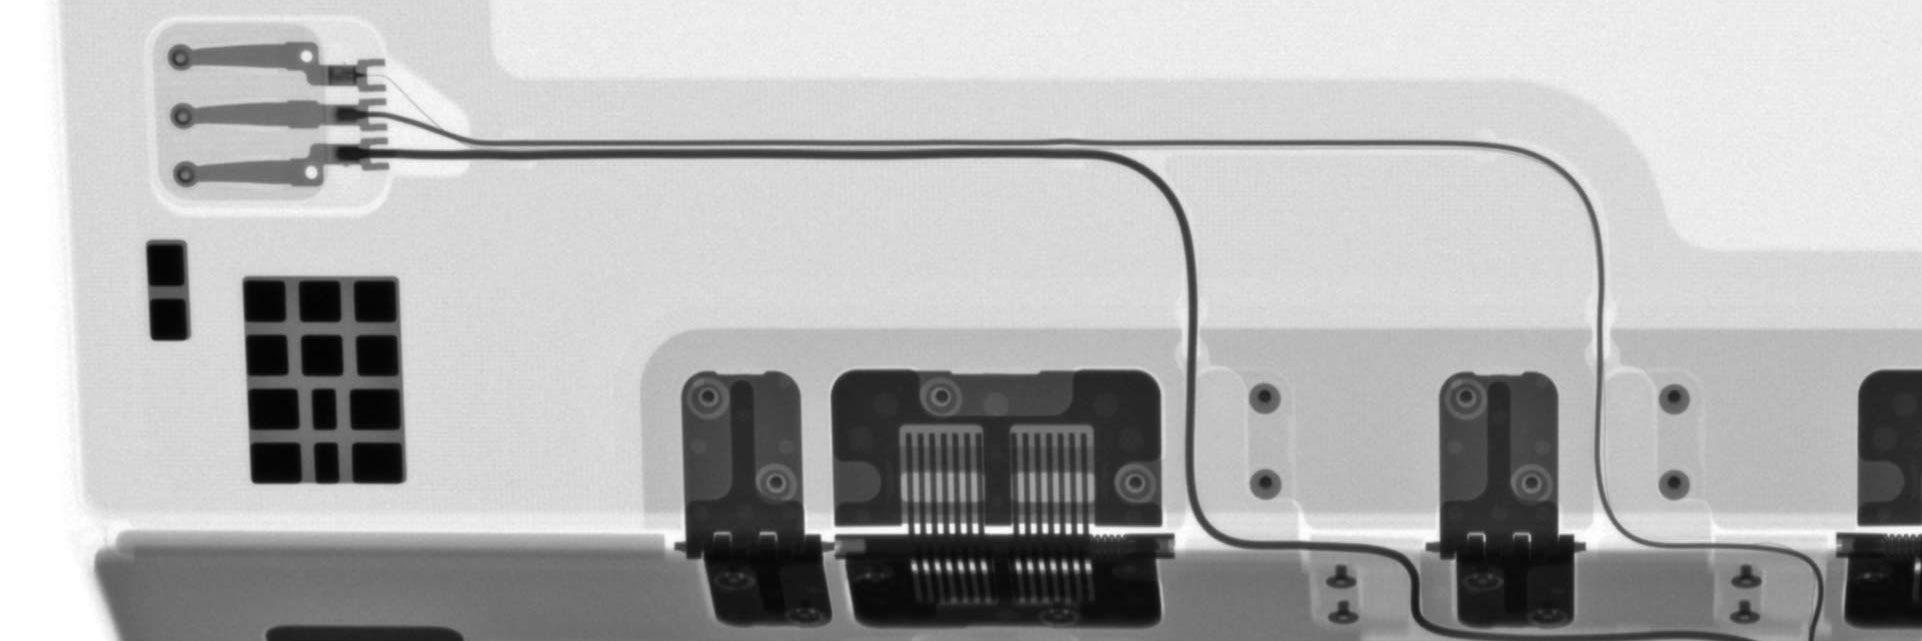 Le Magic Keyboard de l'iPad Pro en look rayons X !